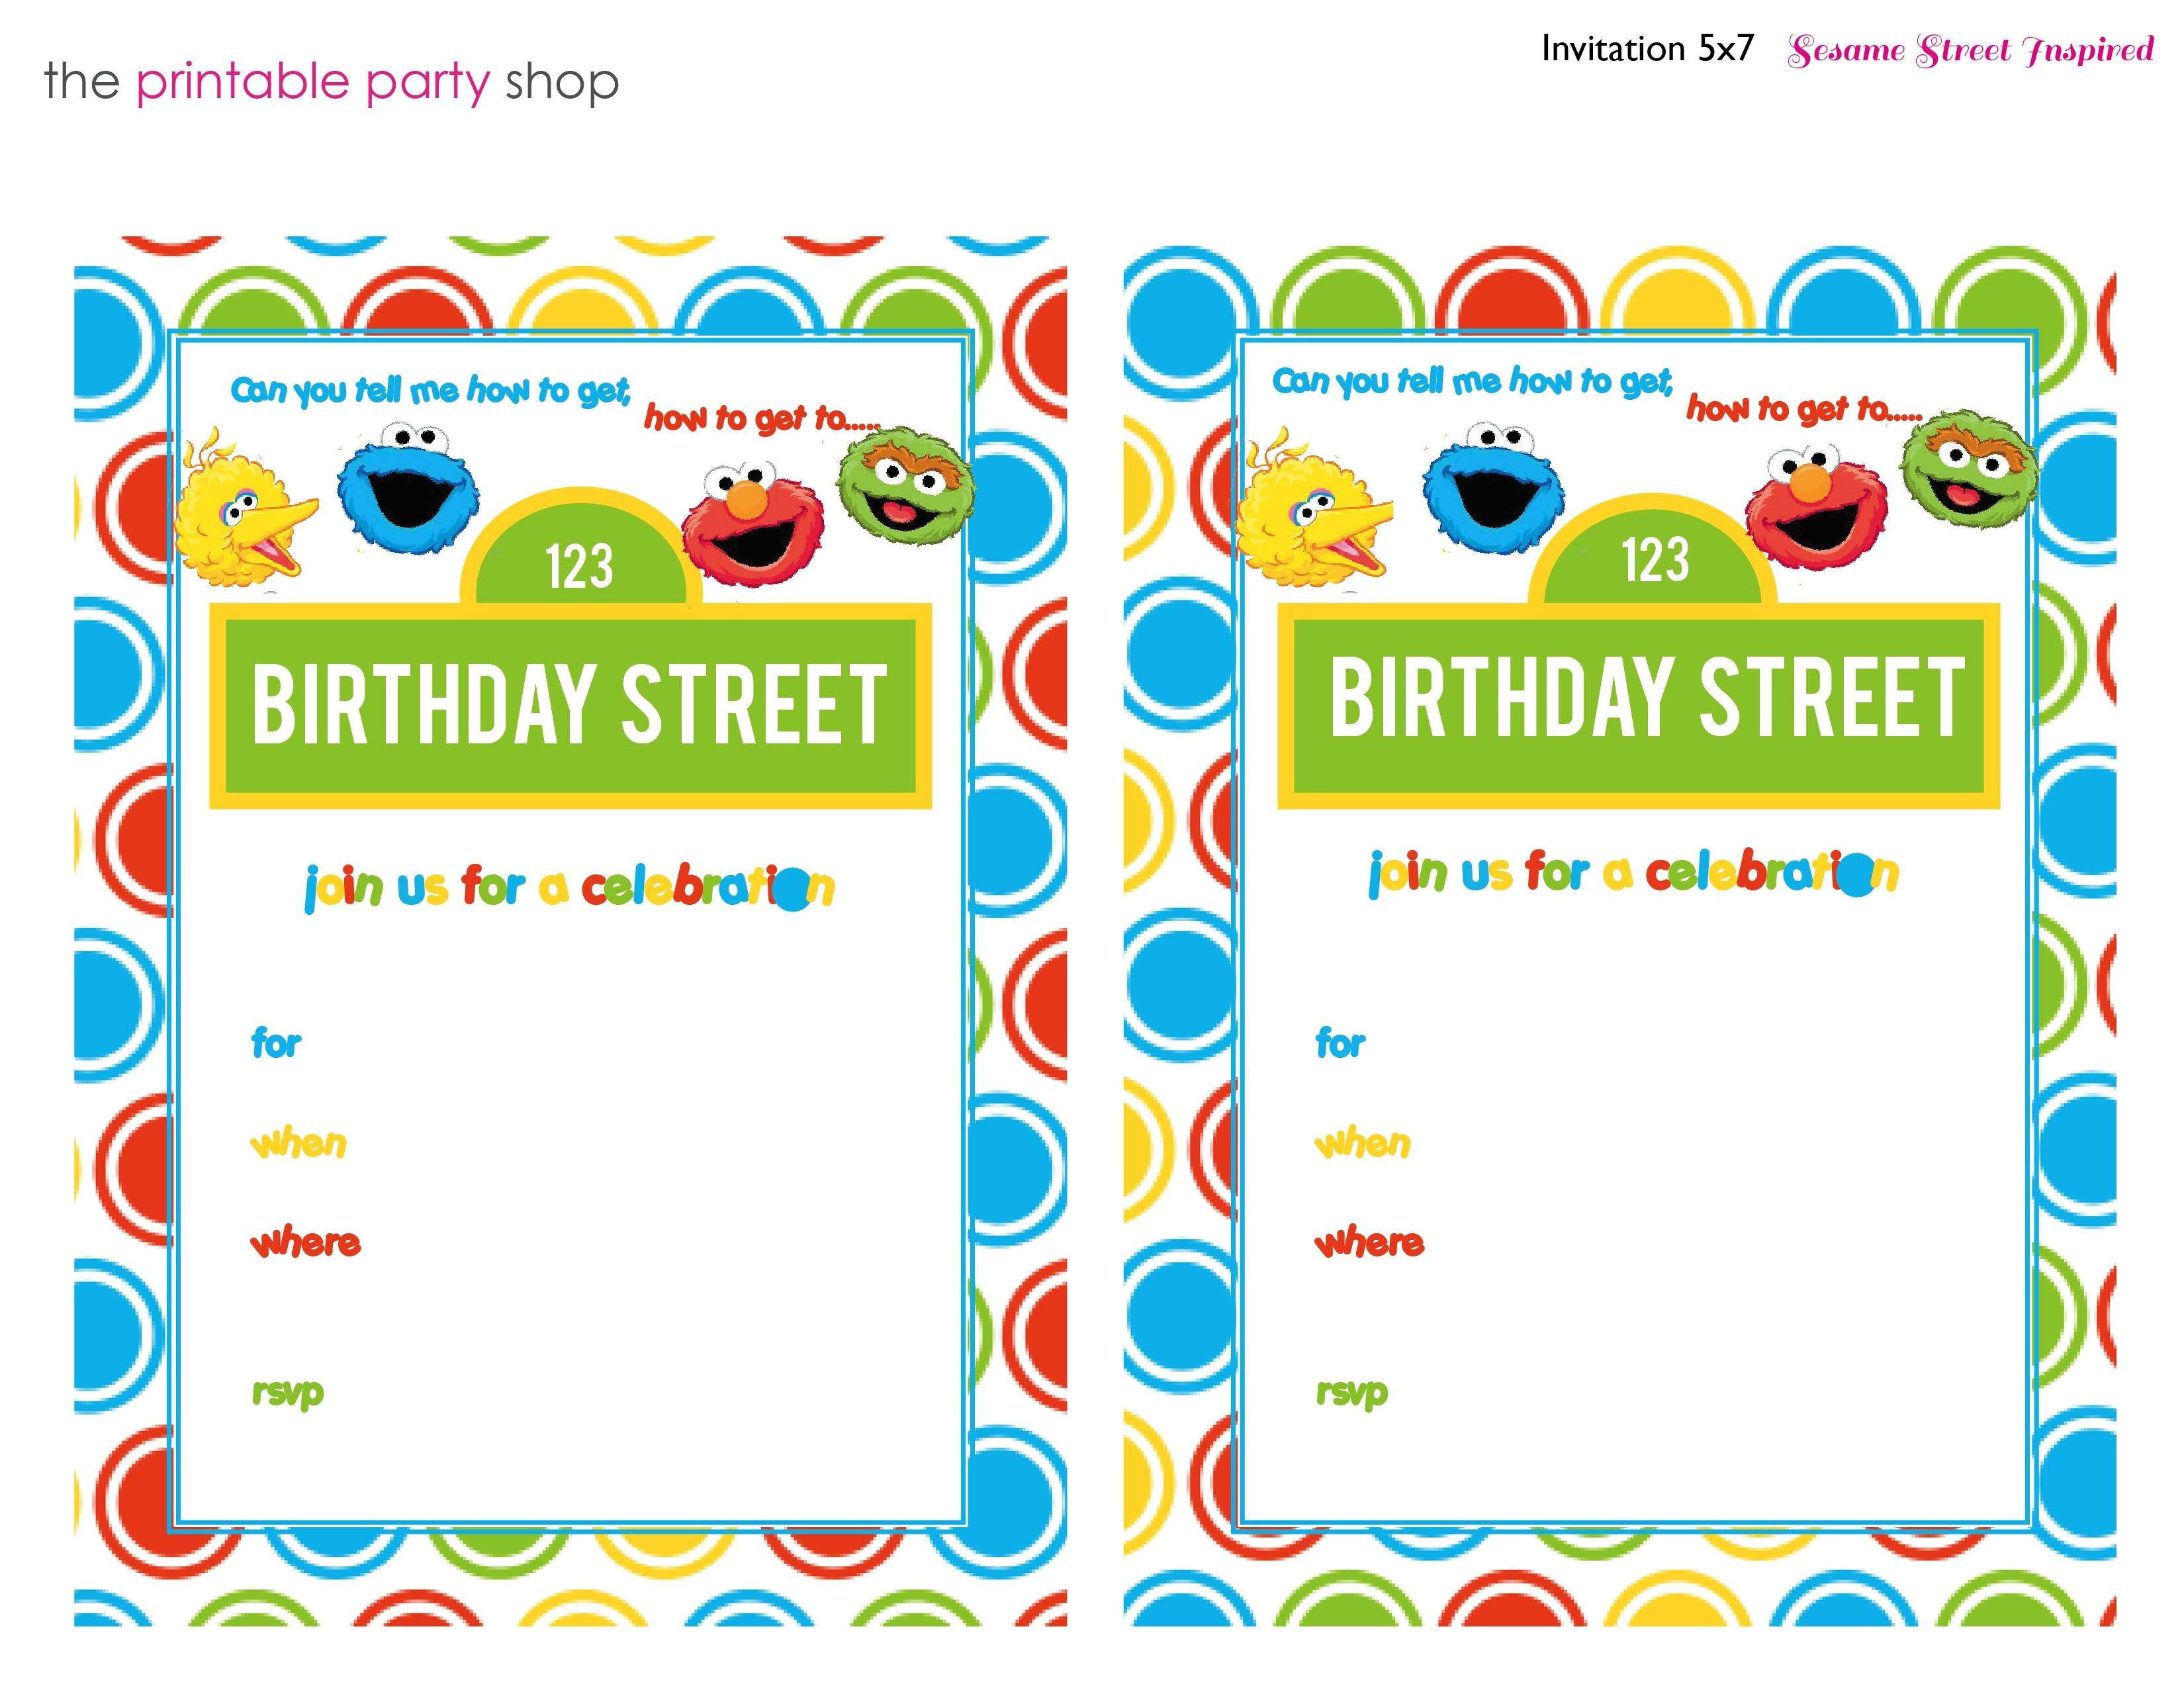 birthday invitation by whatsapp